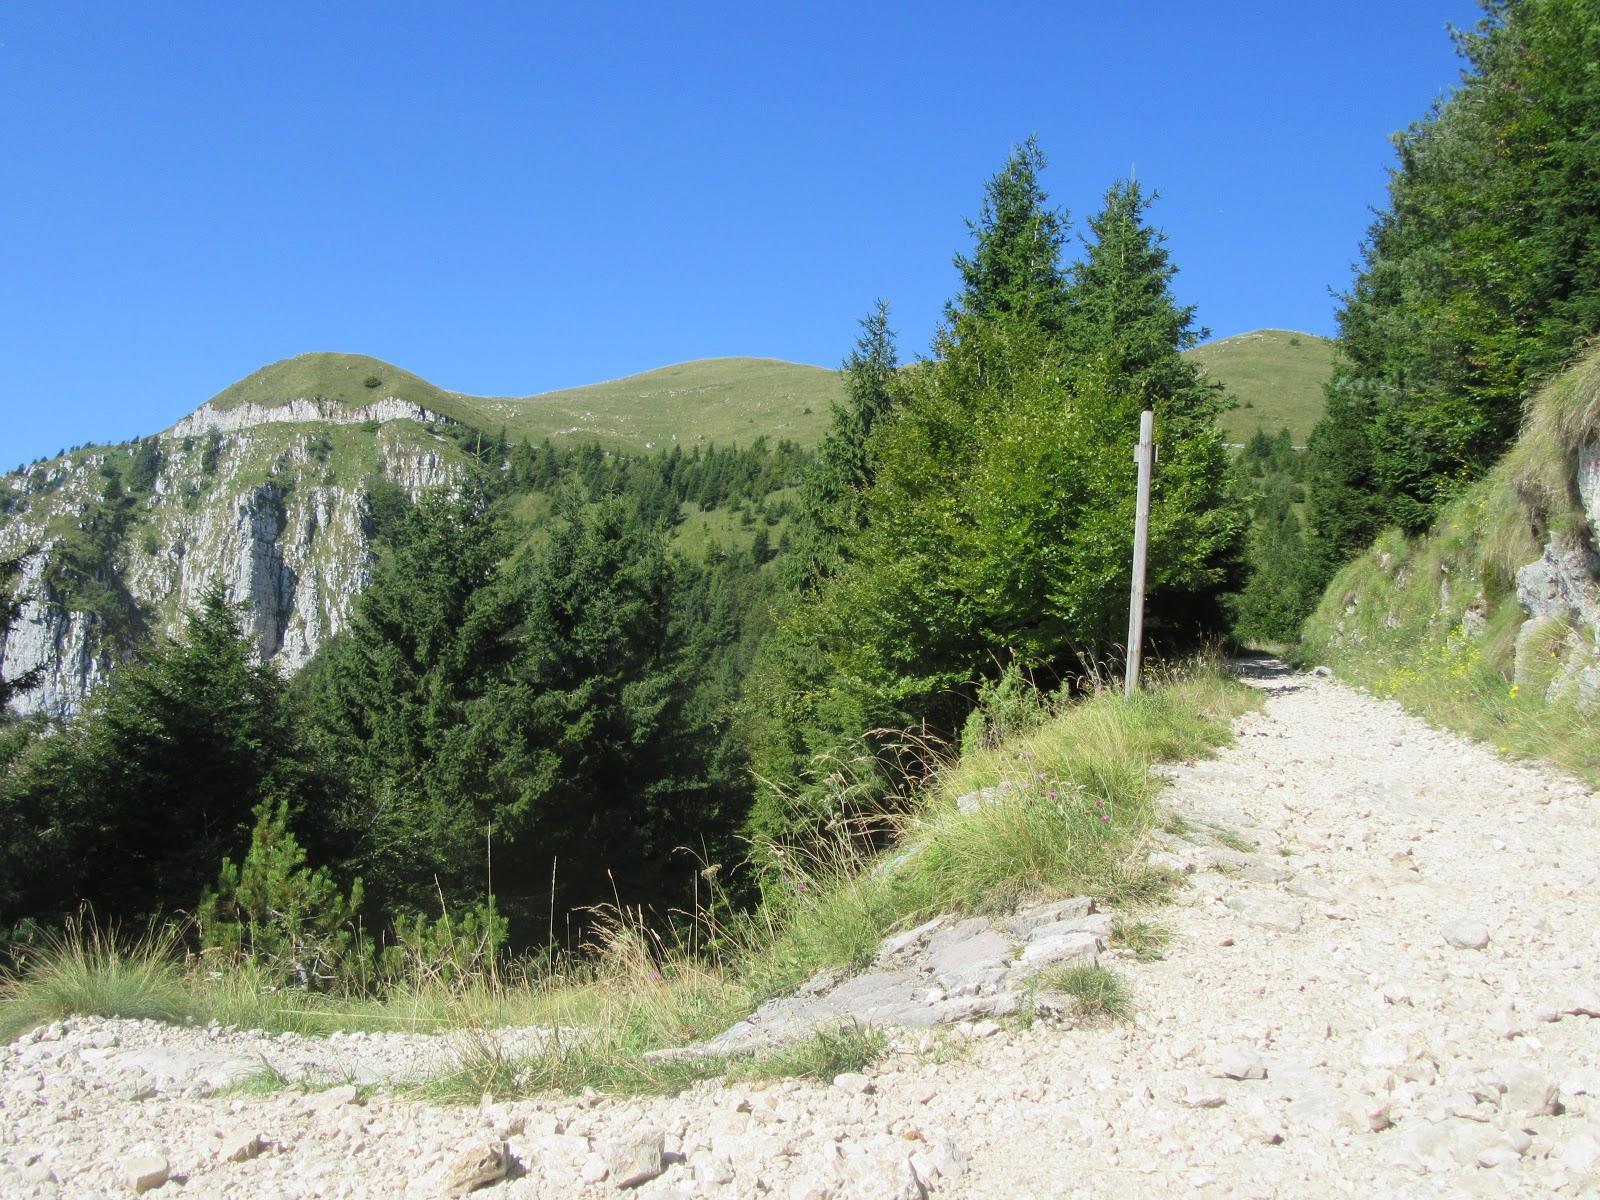 Climbing Monte Grappa from Crespano by bike - roadway cut into mountain